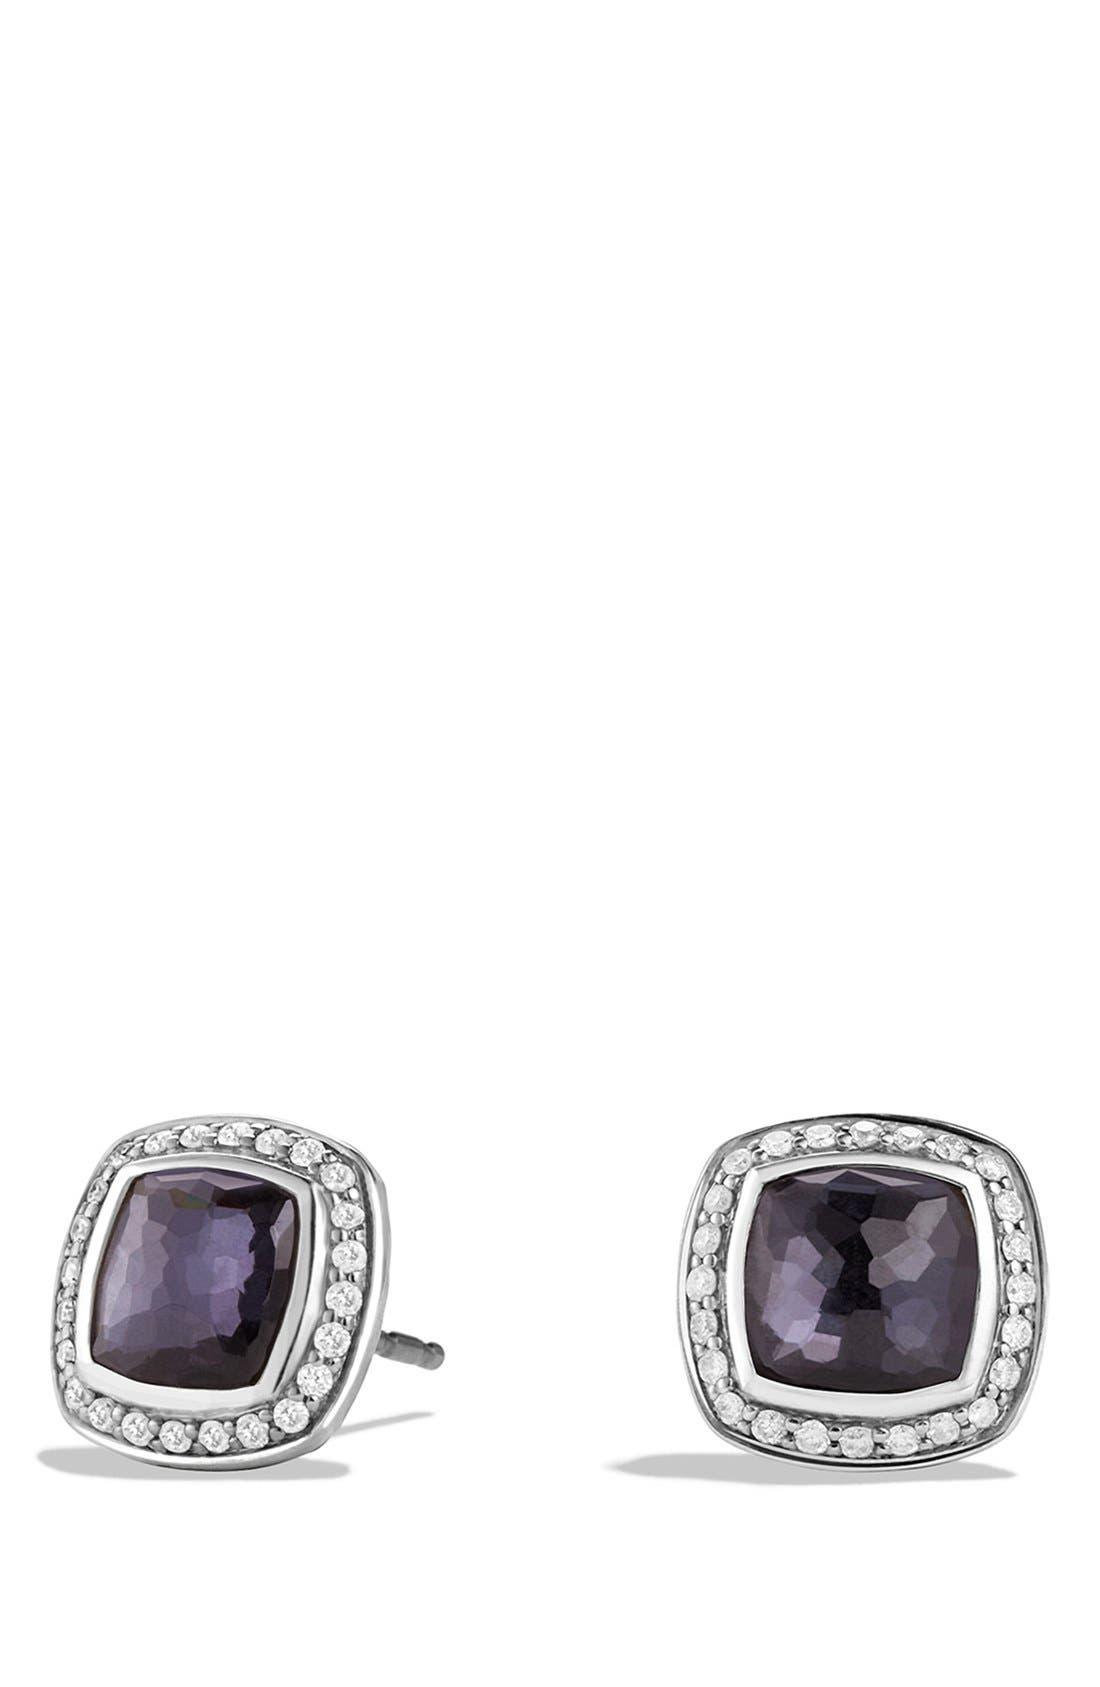 David Yurman 'Albion' Earrings with Semiprecious Stone and Diamonds